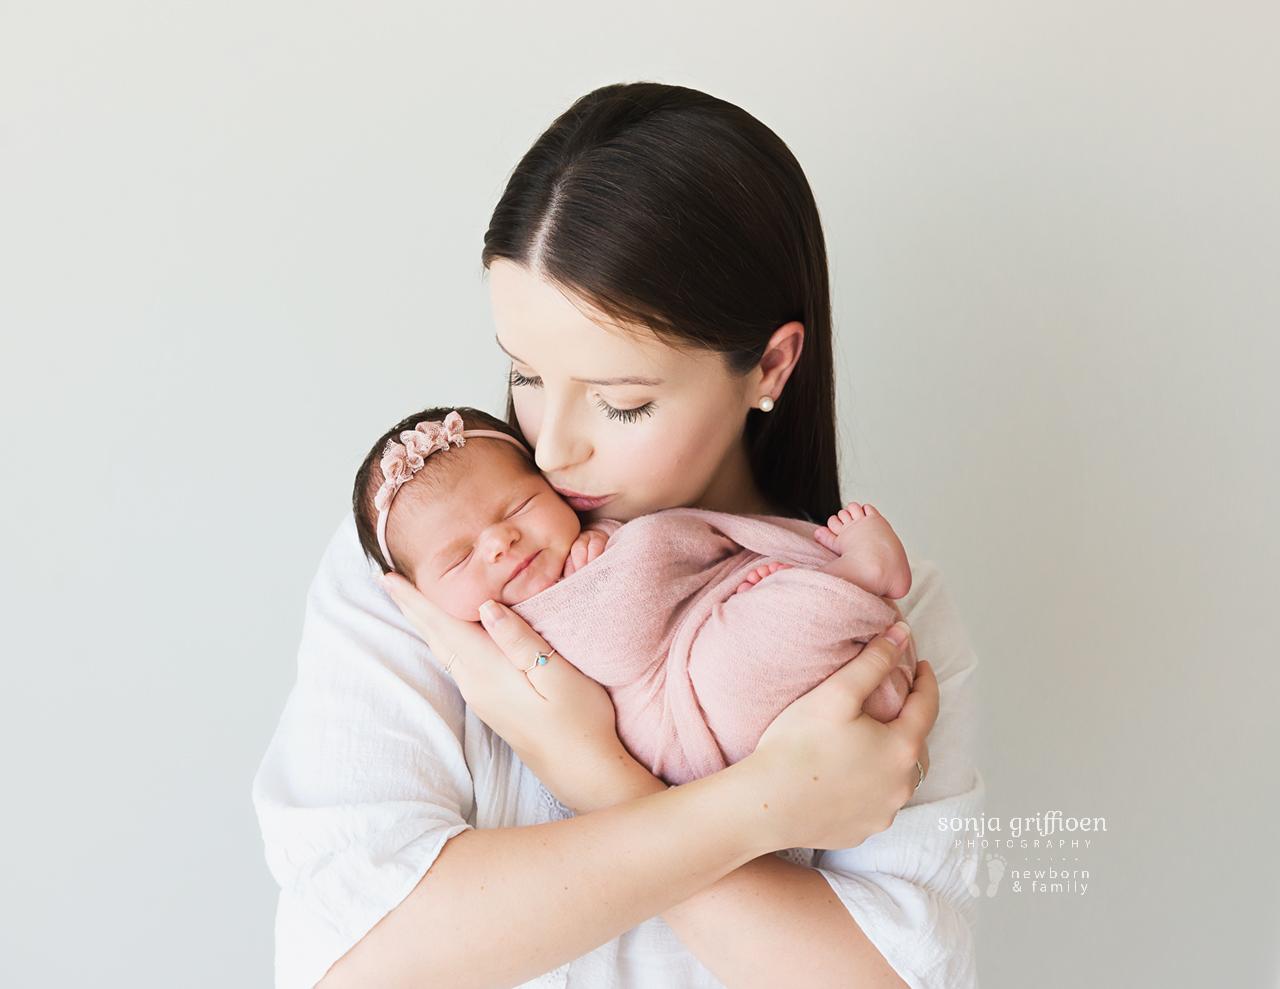 Alessia-Newborn-Brisbane-Newborn-Photographer-Sonja-Griffioen-04.jpg